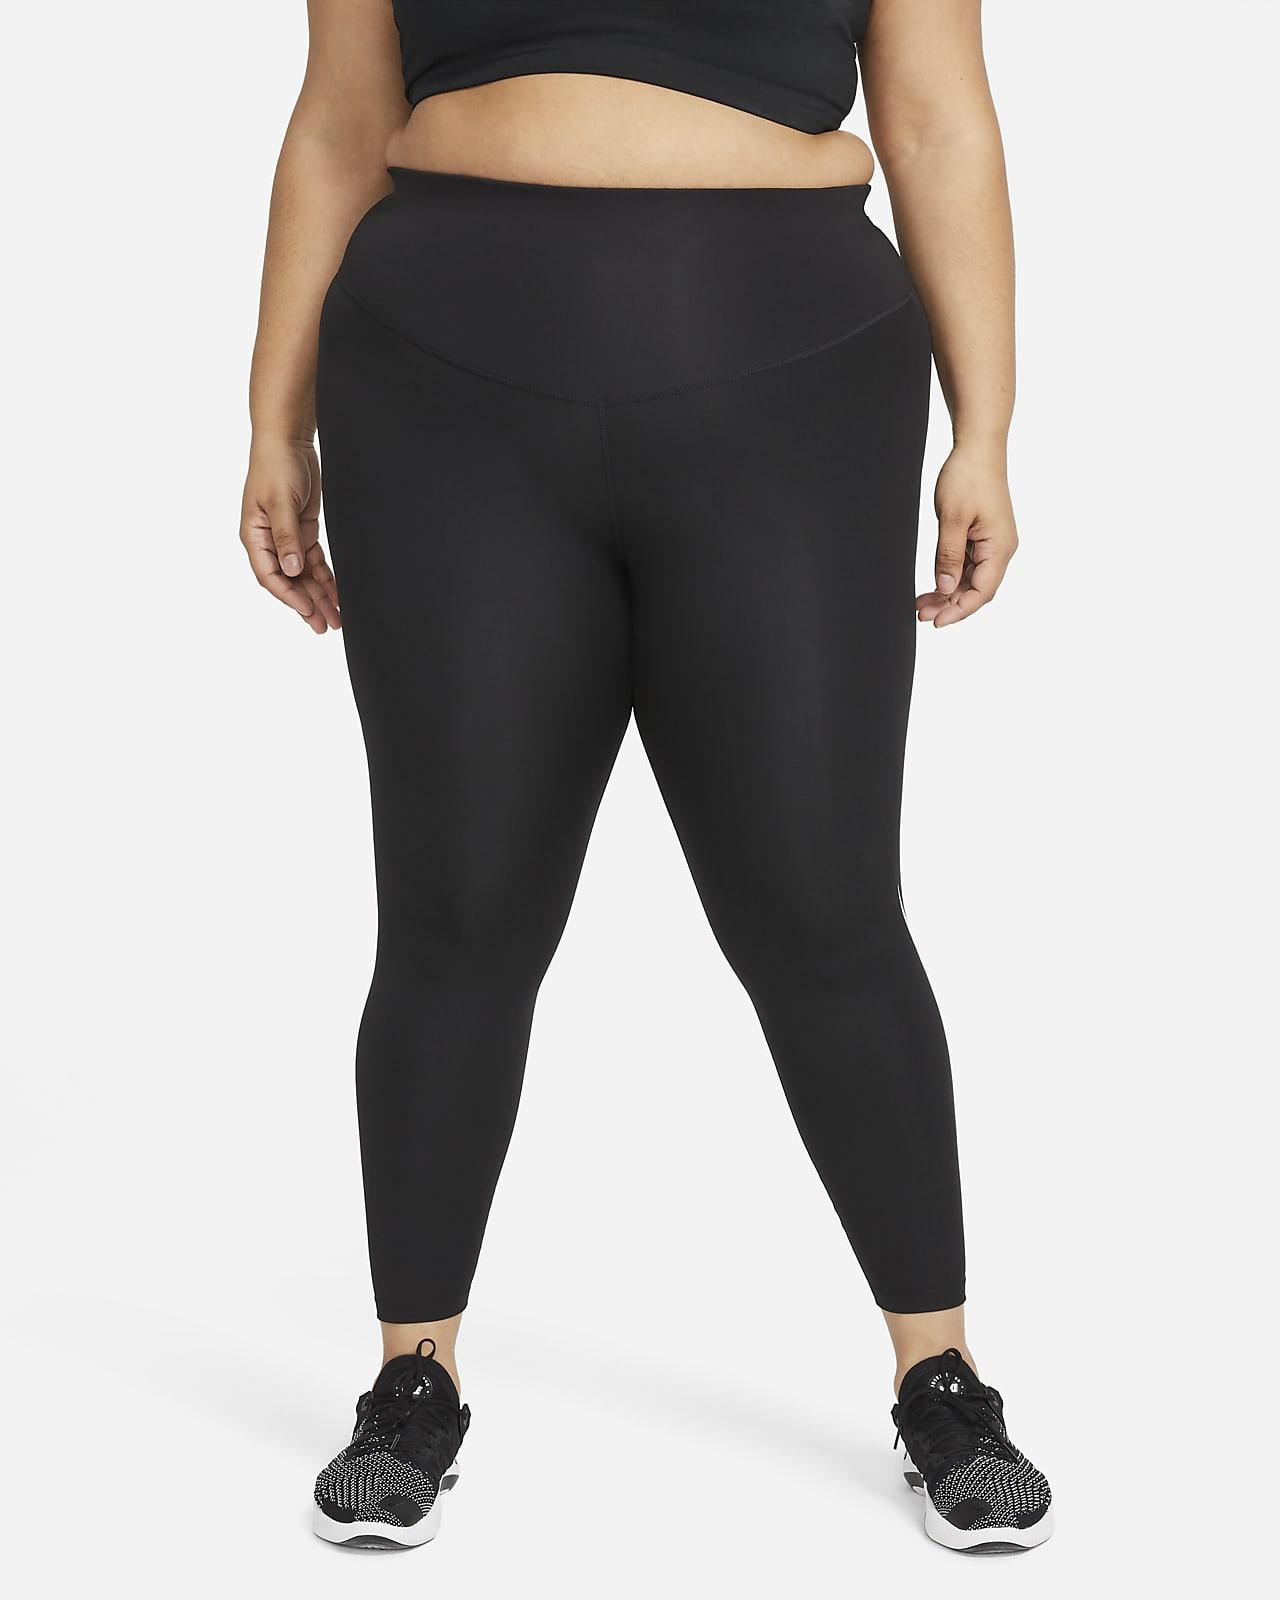 Nike Swoosh Run Women's Mid-Rise 7/8 Running Leggings (Plus Size)